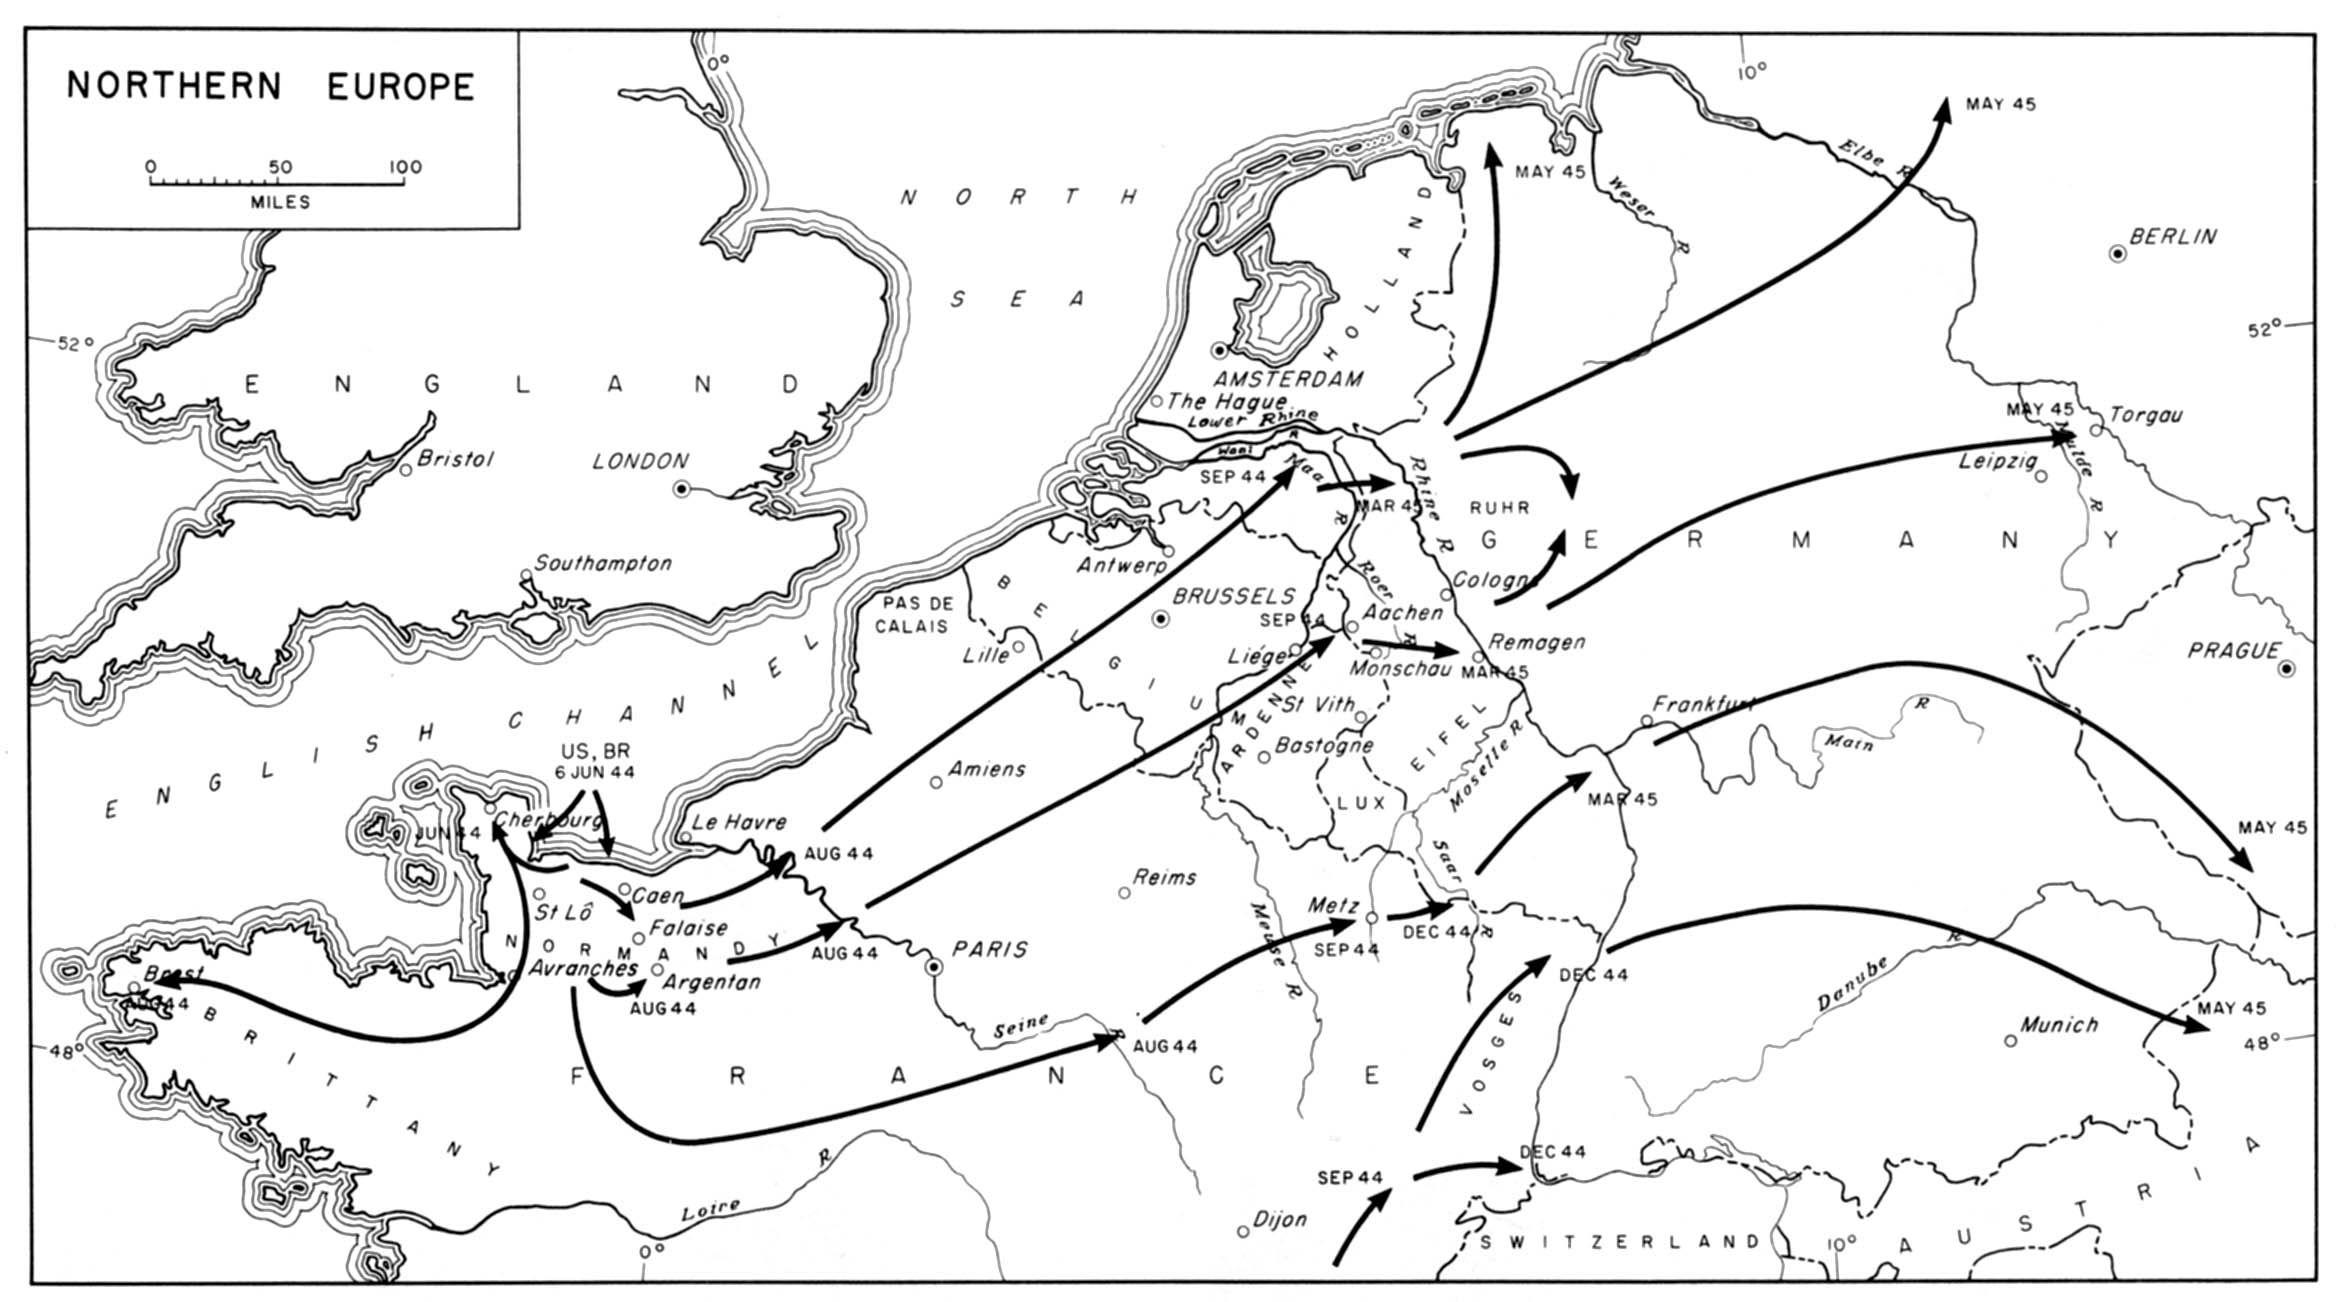 Mapa De La Ofensiva Aliada En La Europa Occidental Tras El